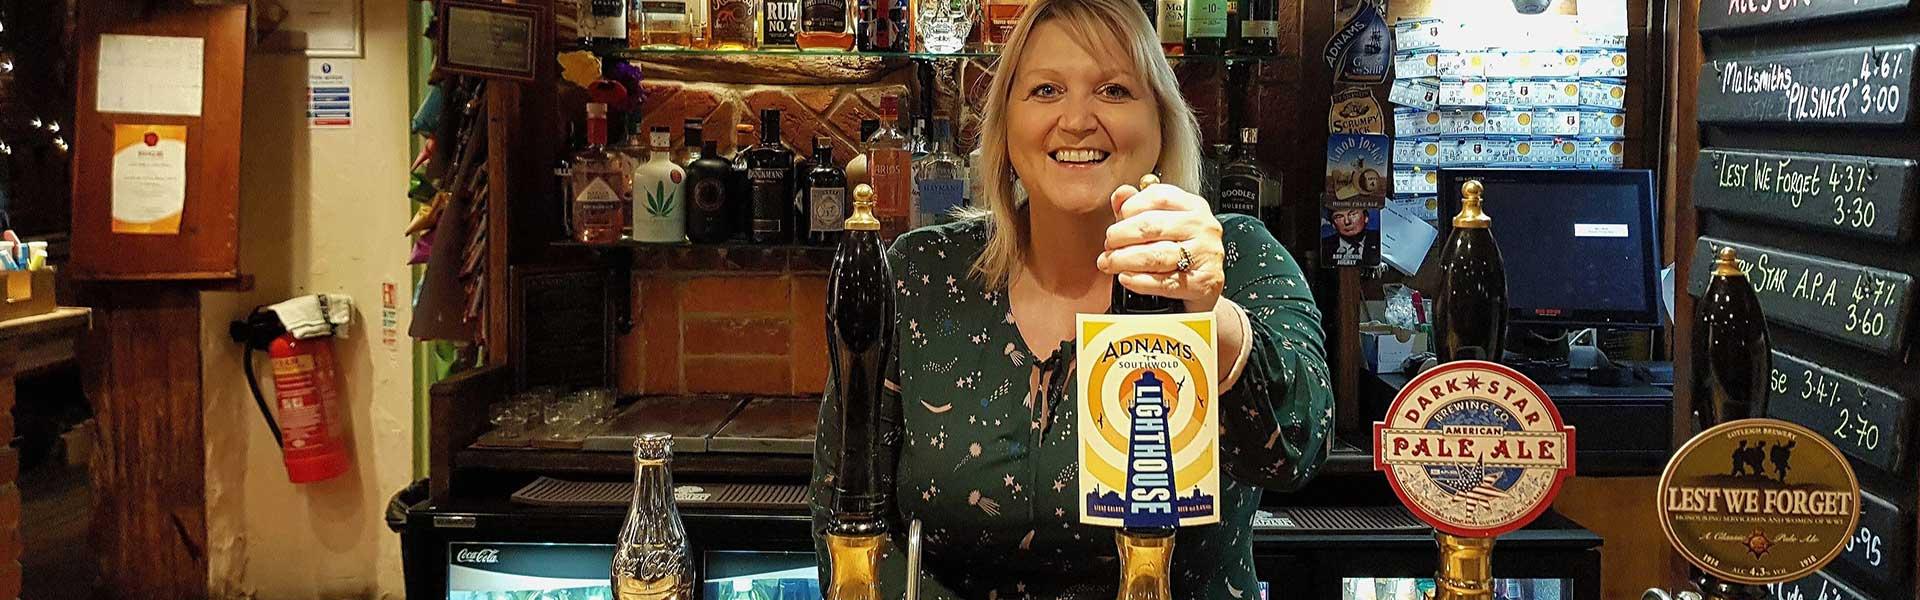 Karen Constantine behind the var in The Churchill Tavern, Ramsgate